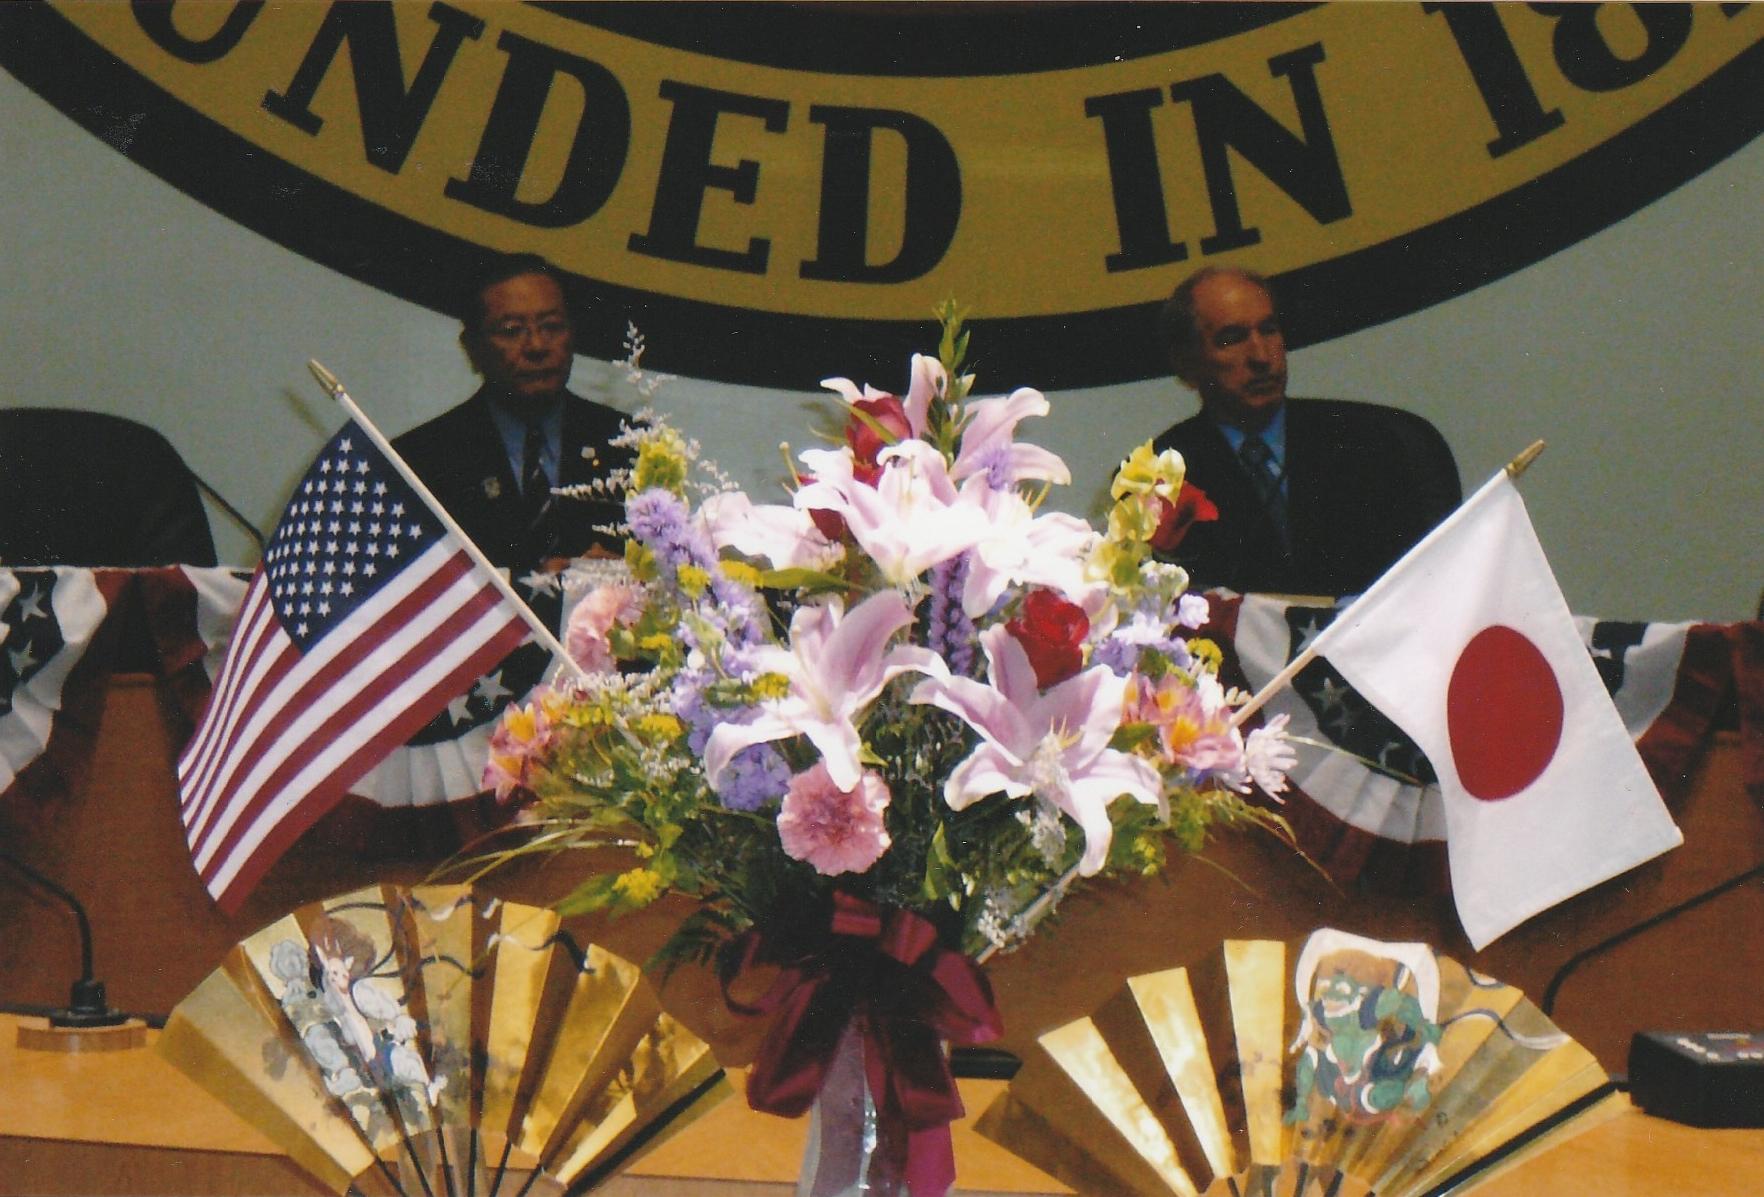 Mayor Shohei Shimizu and Mayor Patrick Morris in 2009, celebrating the 50th anniversary.